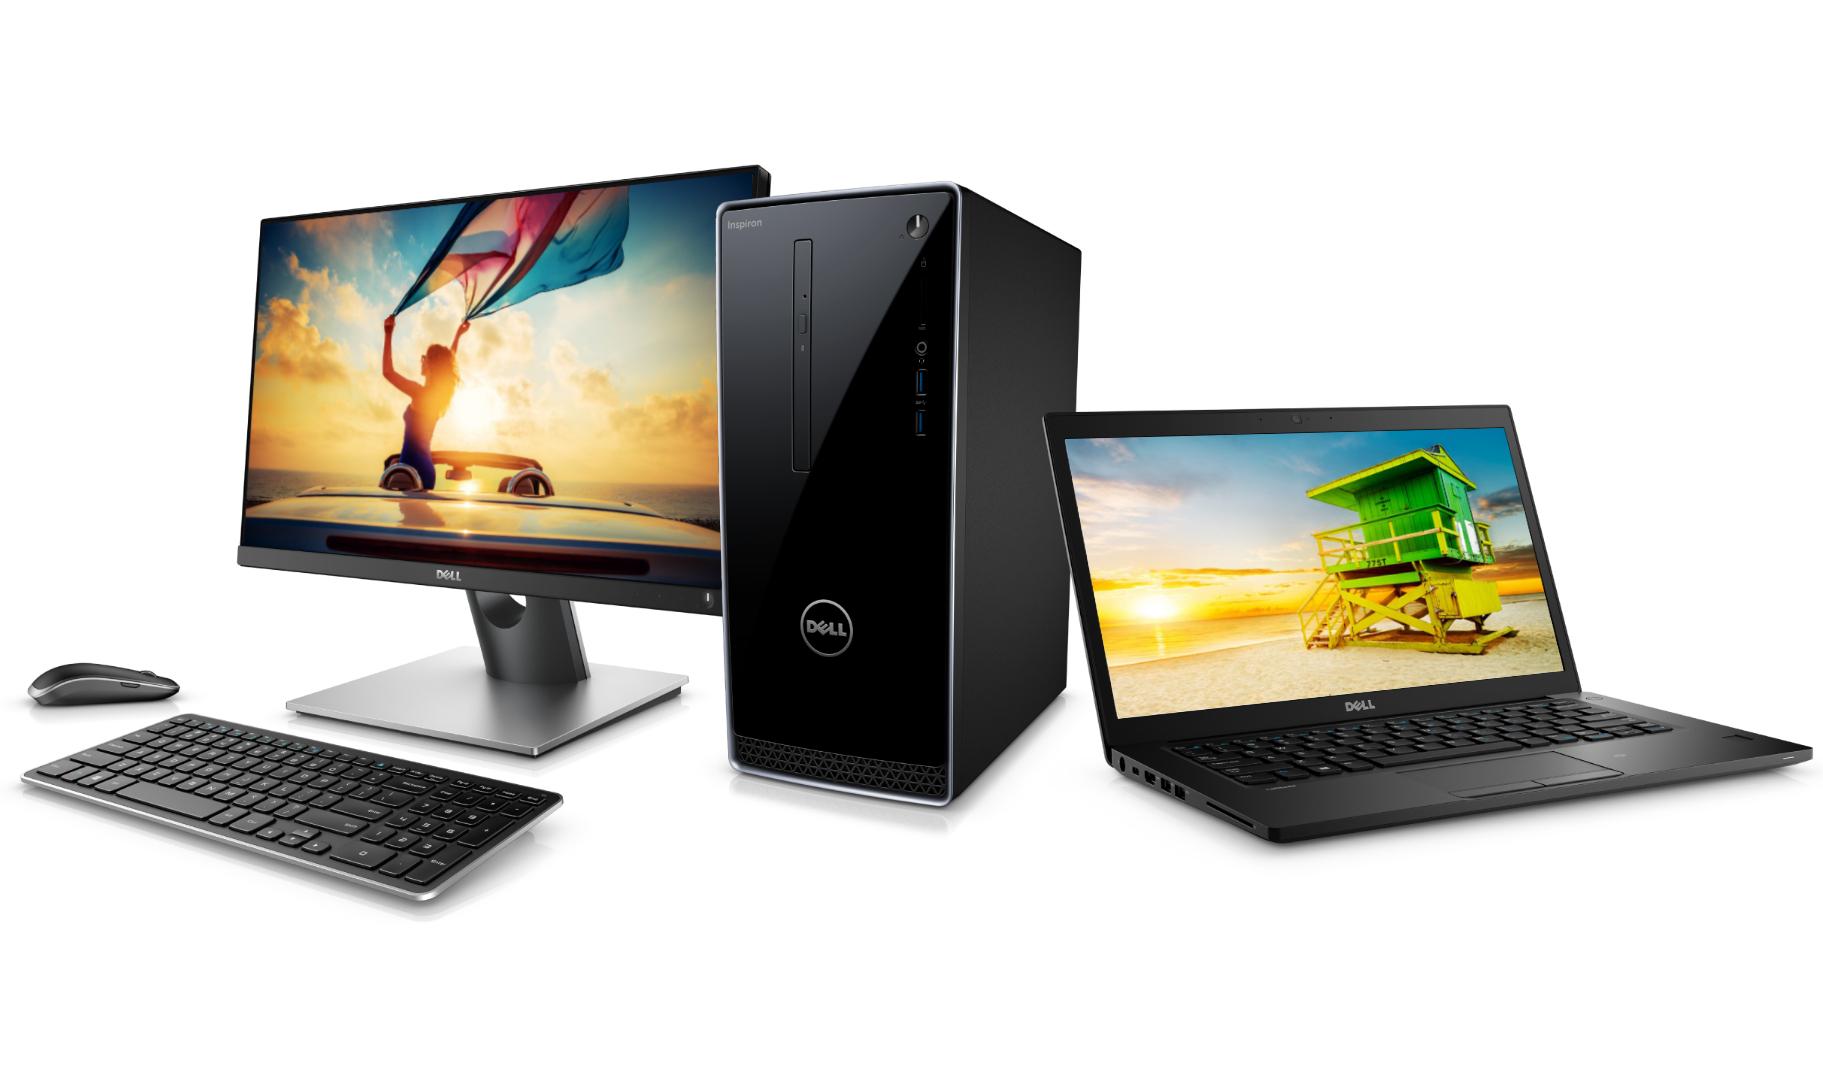 Dell XPS Deals ⇒ Cheap Price, Best Sales in UK - hotukdeals